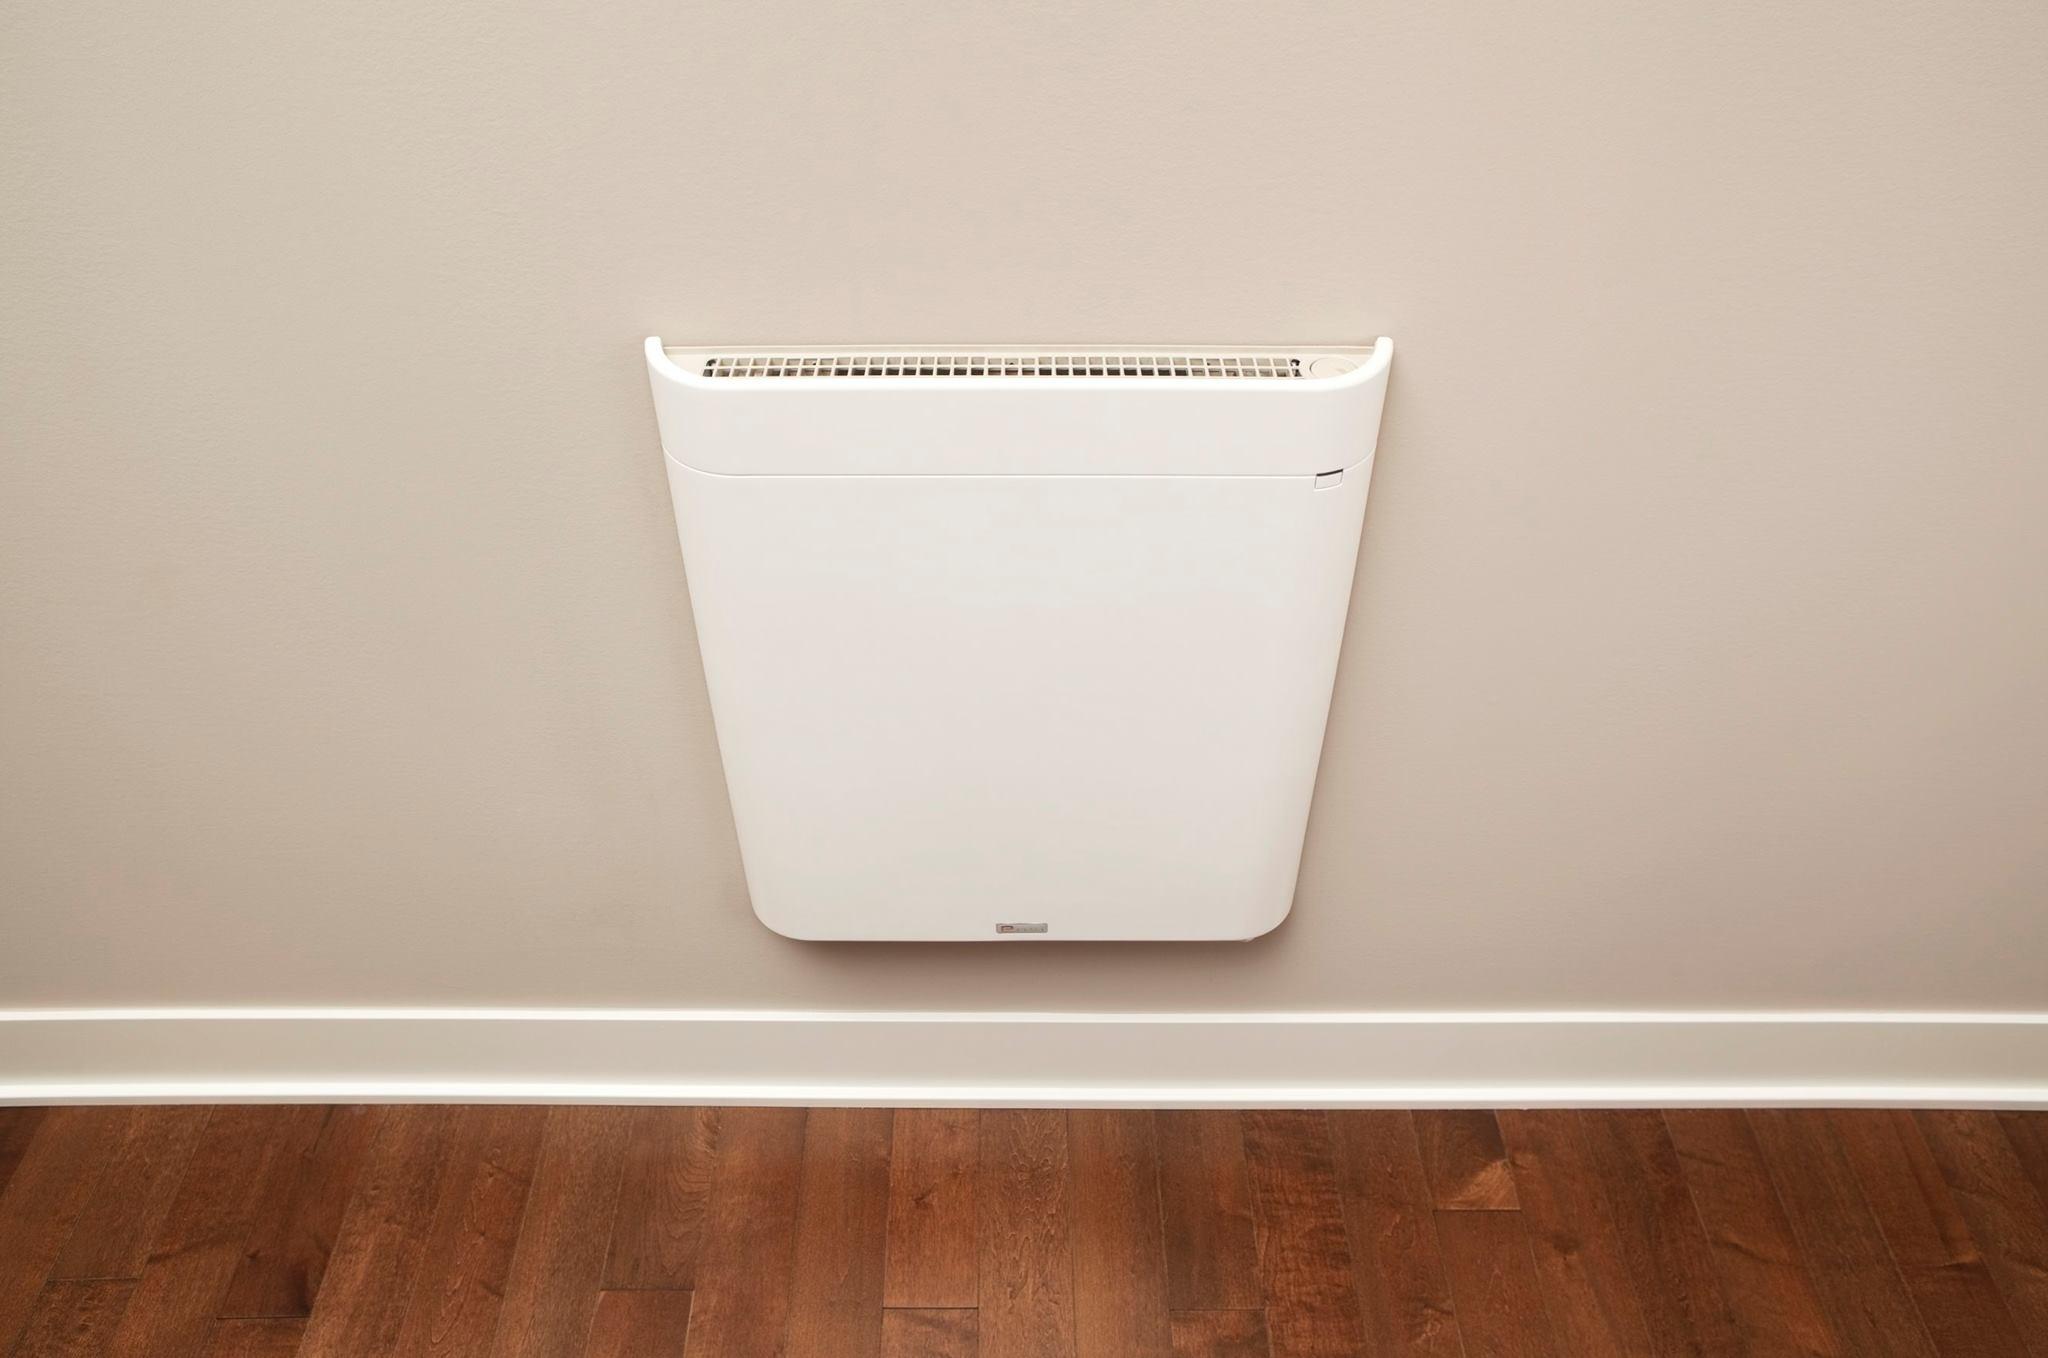 Envi Heater Plug In Christmas gift